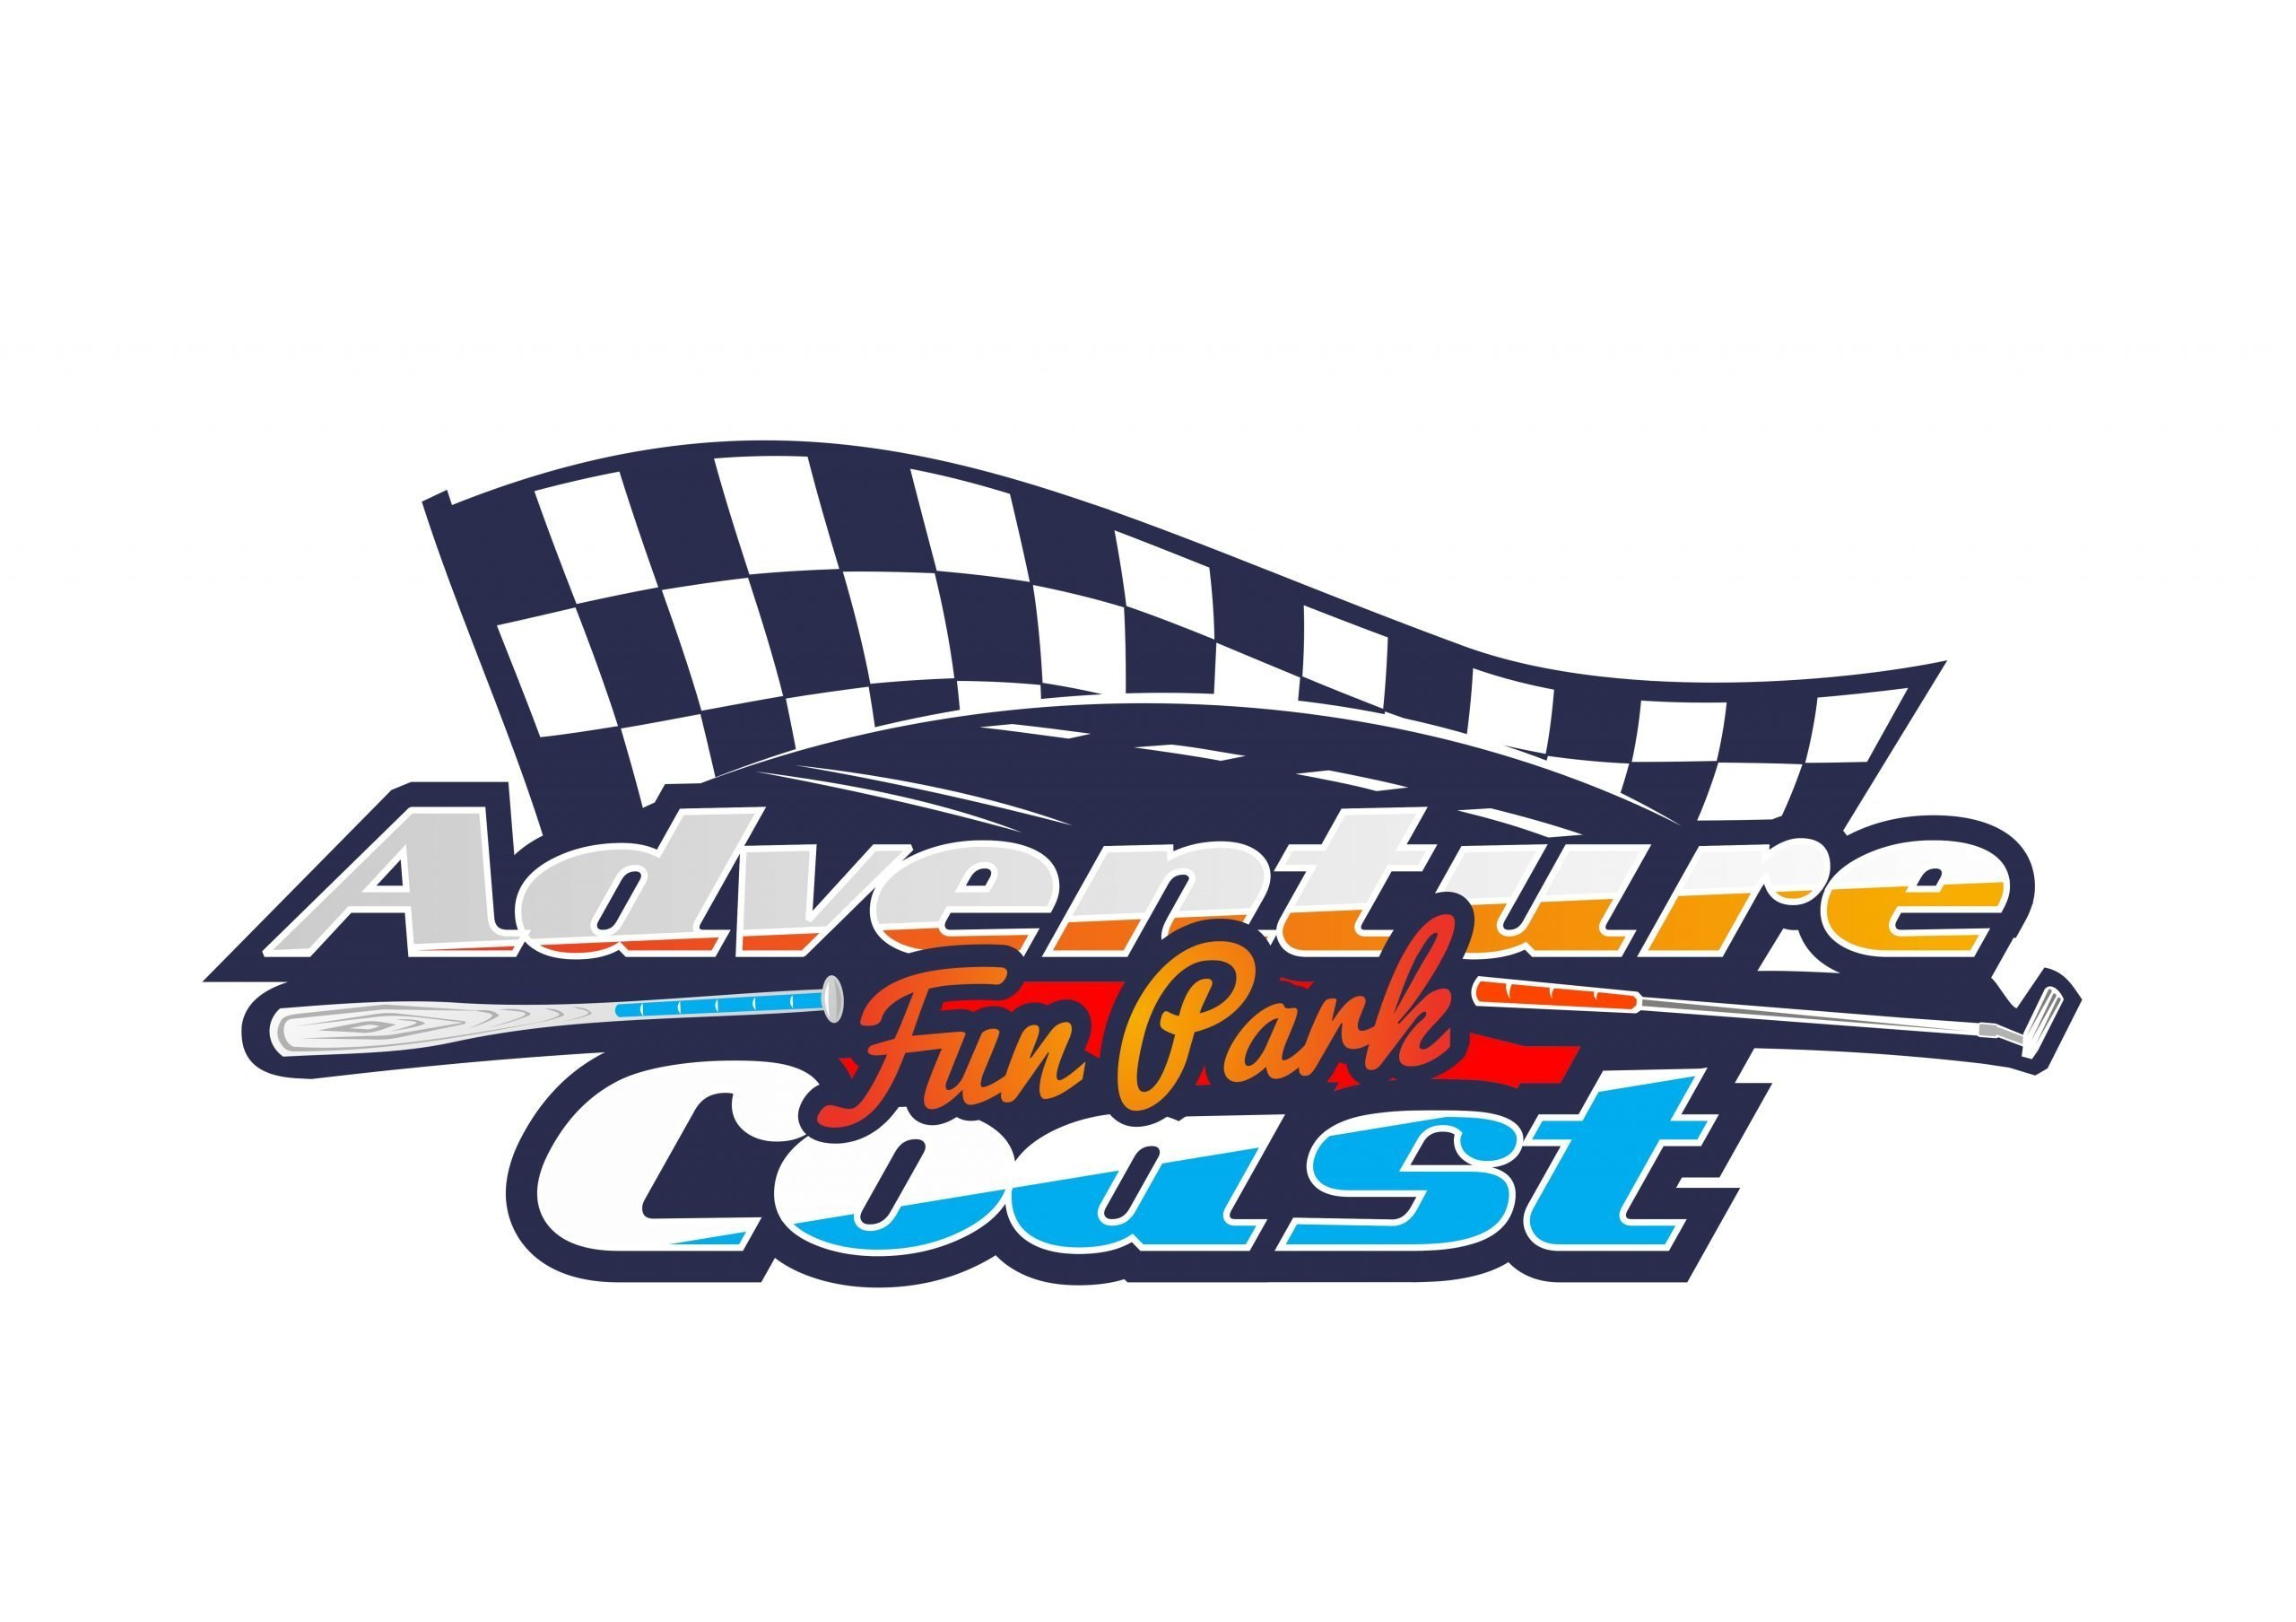 adventure coast fun park - spring hill fl - vermillion enterprises - spring hill gold and coin buyer - serving spring hill